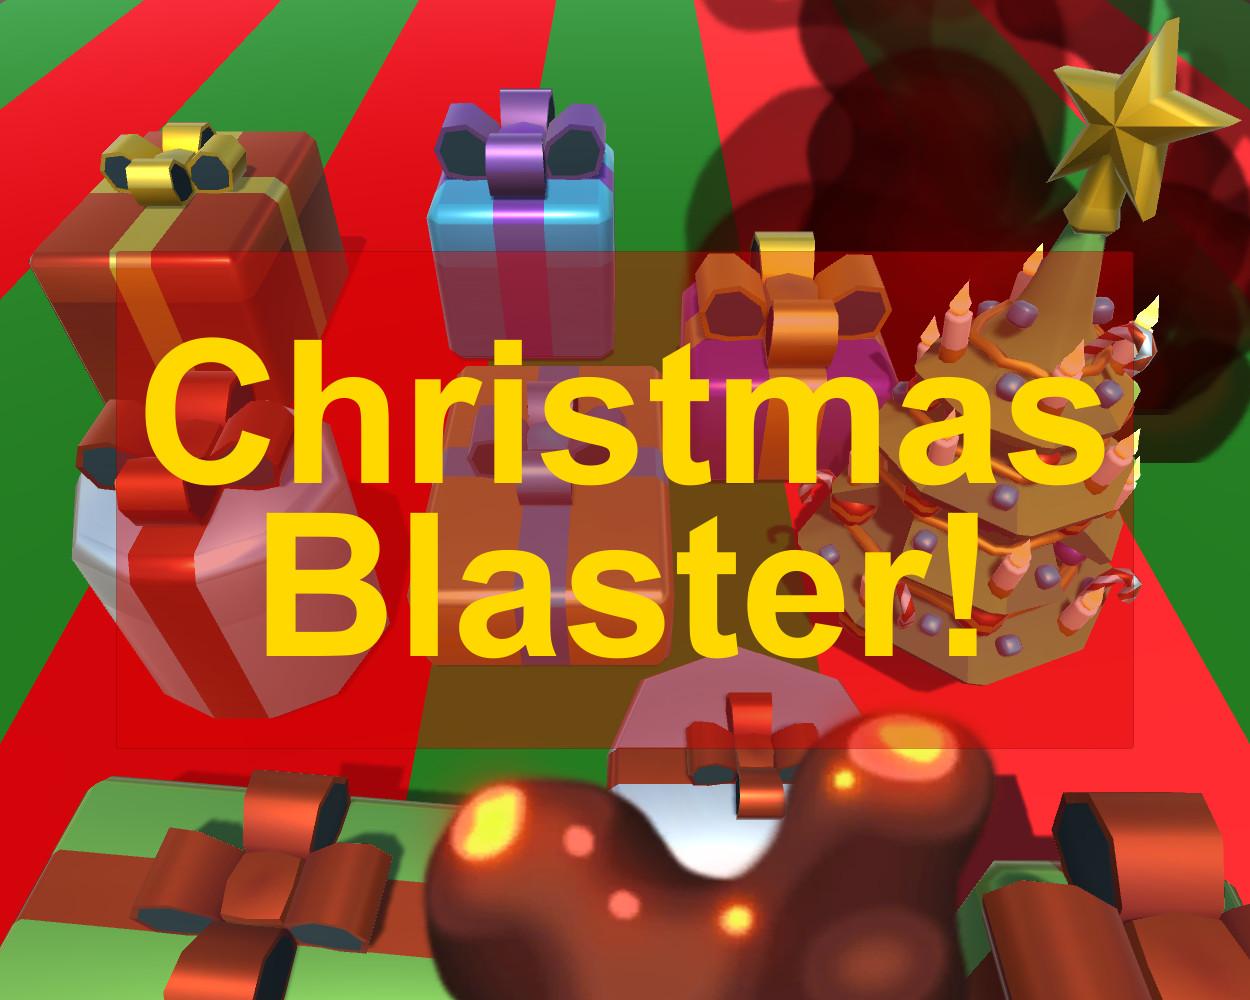 Christmas Blaster!